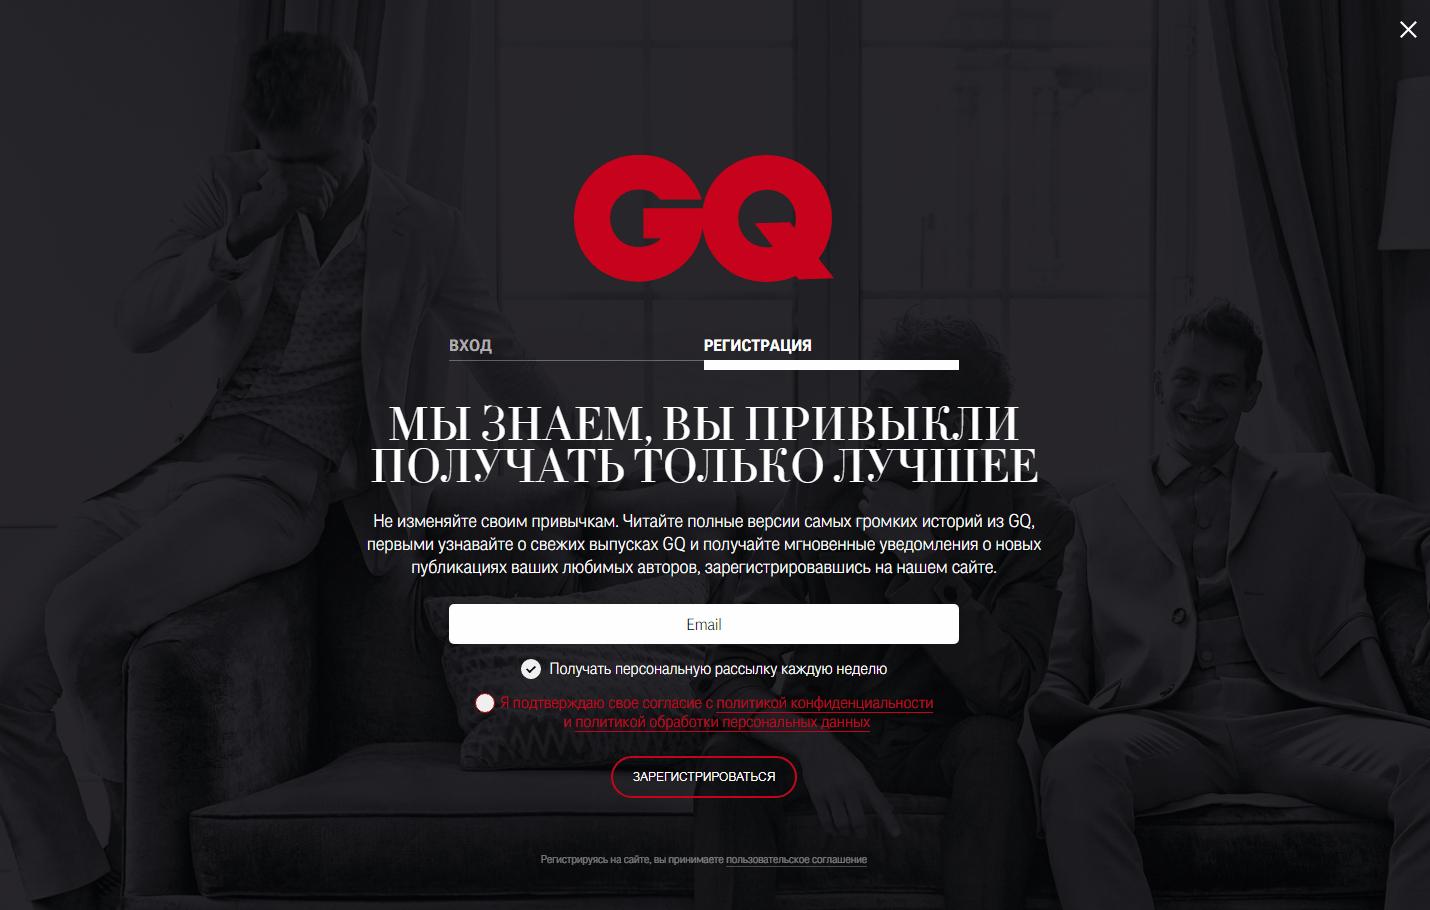 Форма подписки онлайн-журнала GQ